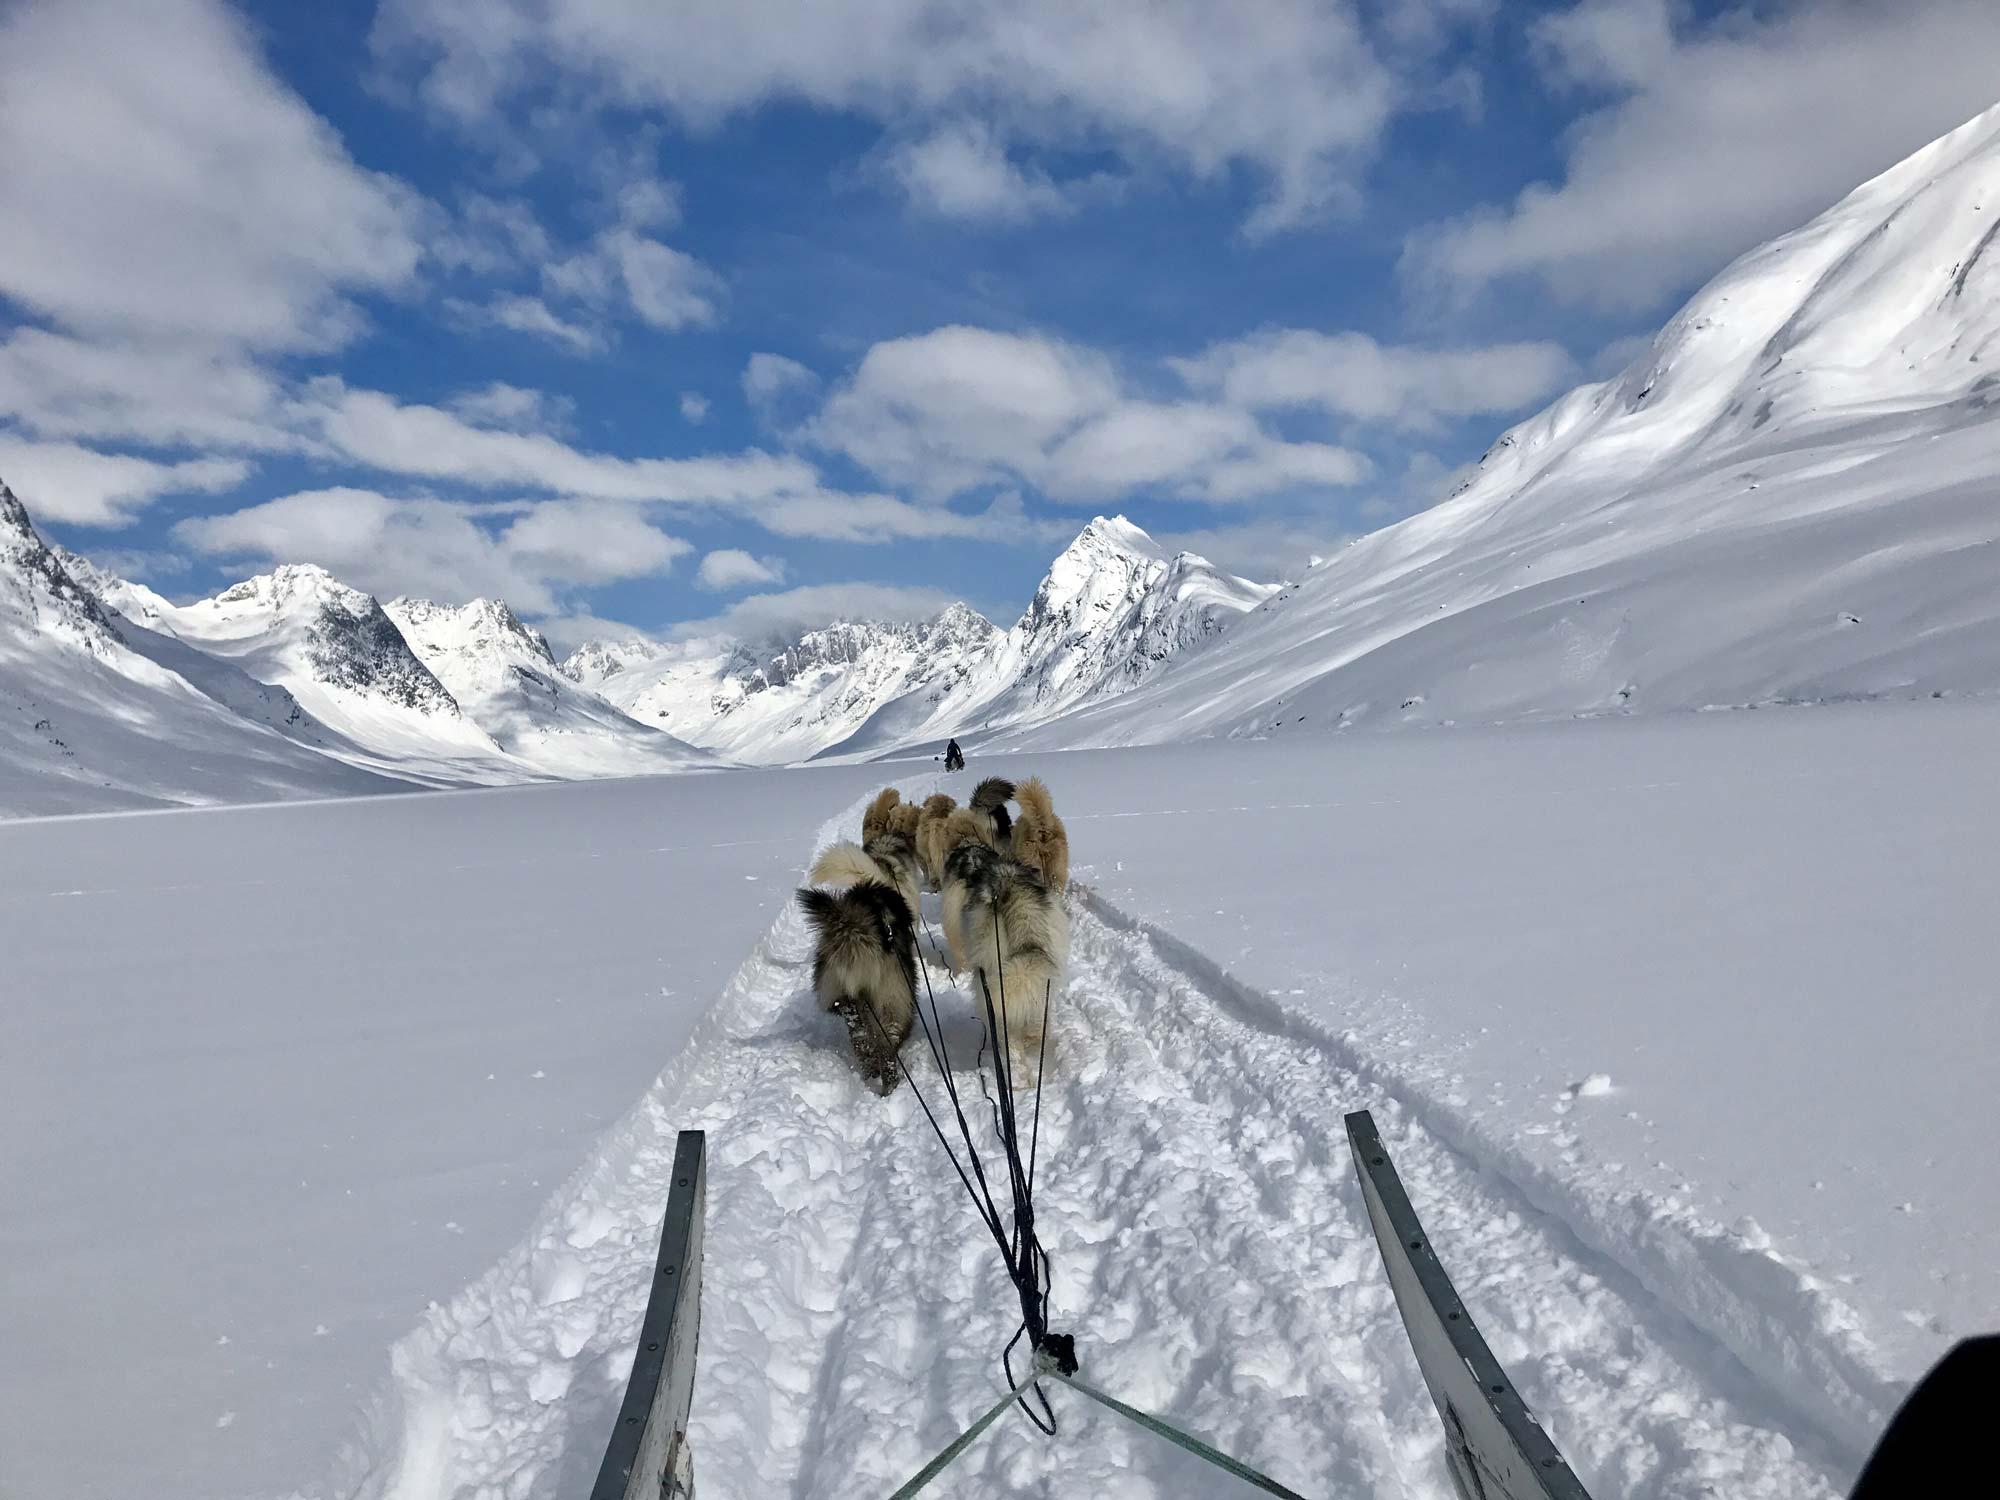 east-greenland-ski-expedition-2.jpg